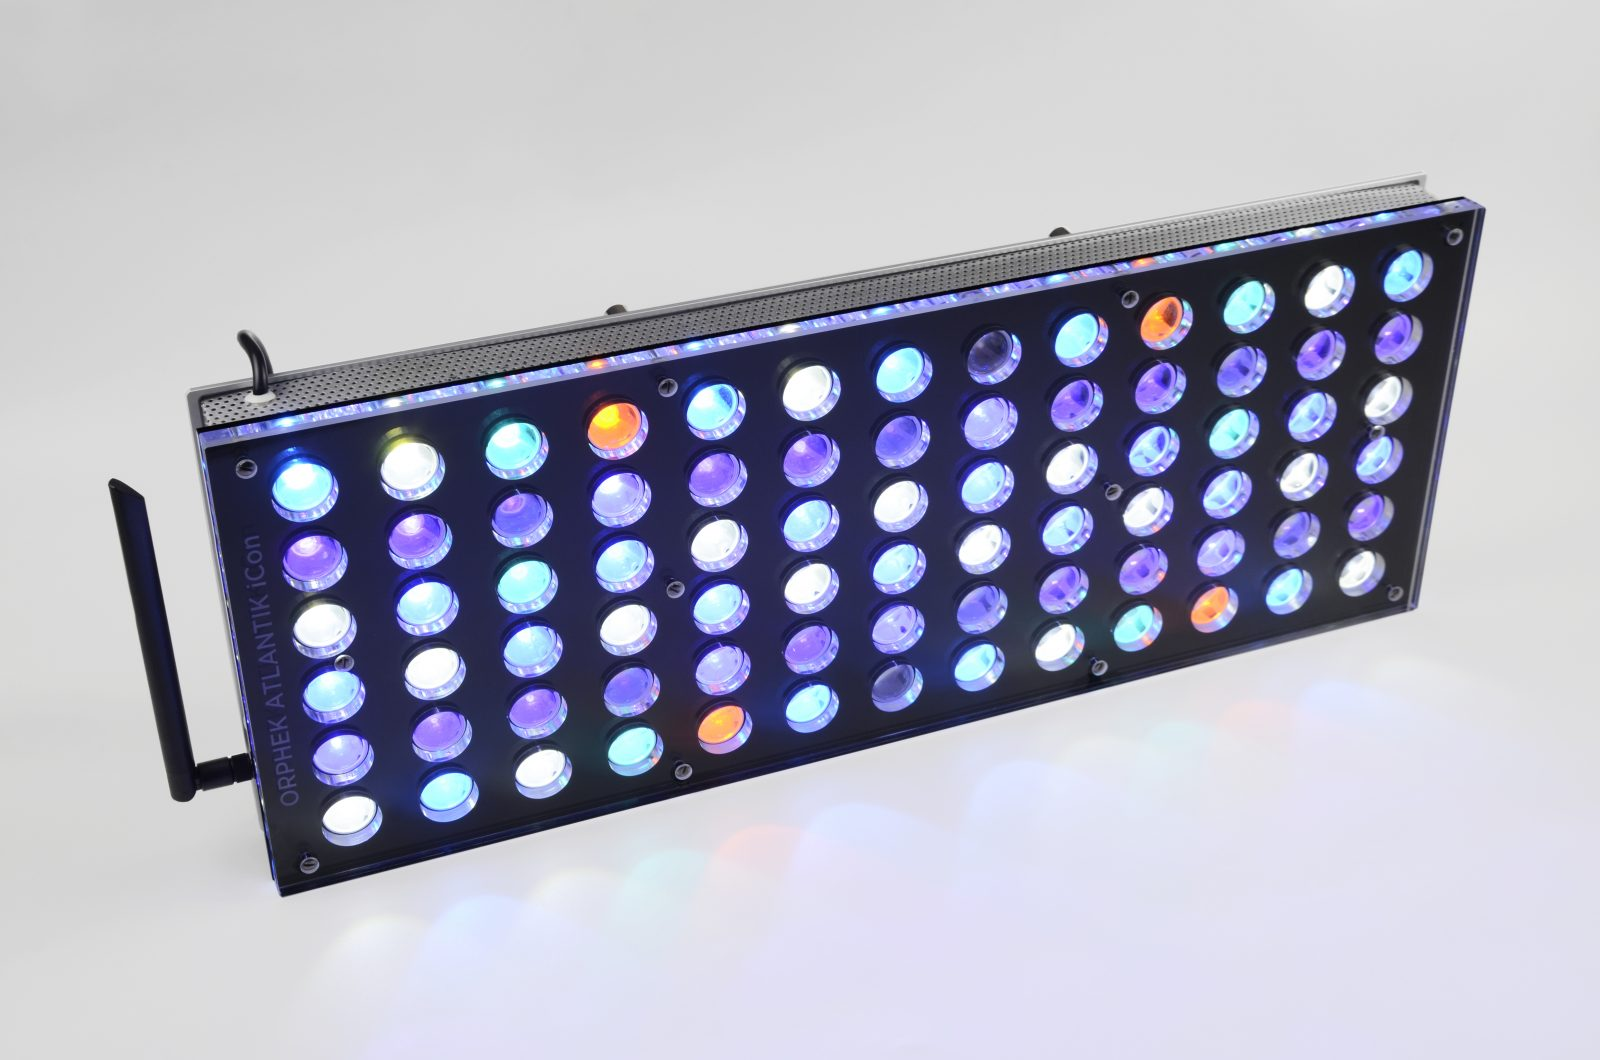 Lancio del nuovo prodotto Atlantik iCon Reef Aquarium LED Lighting